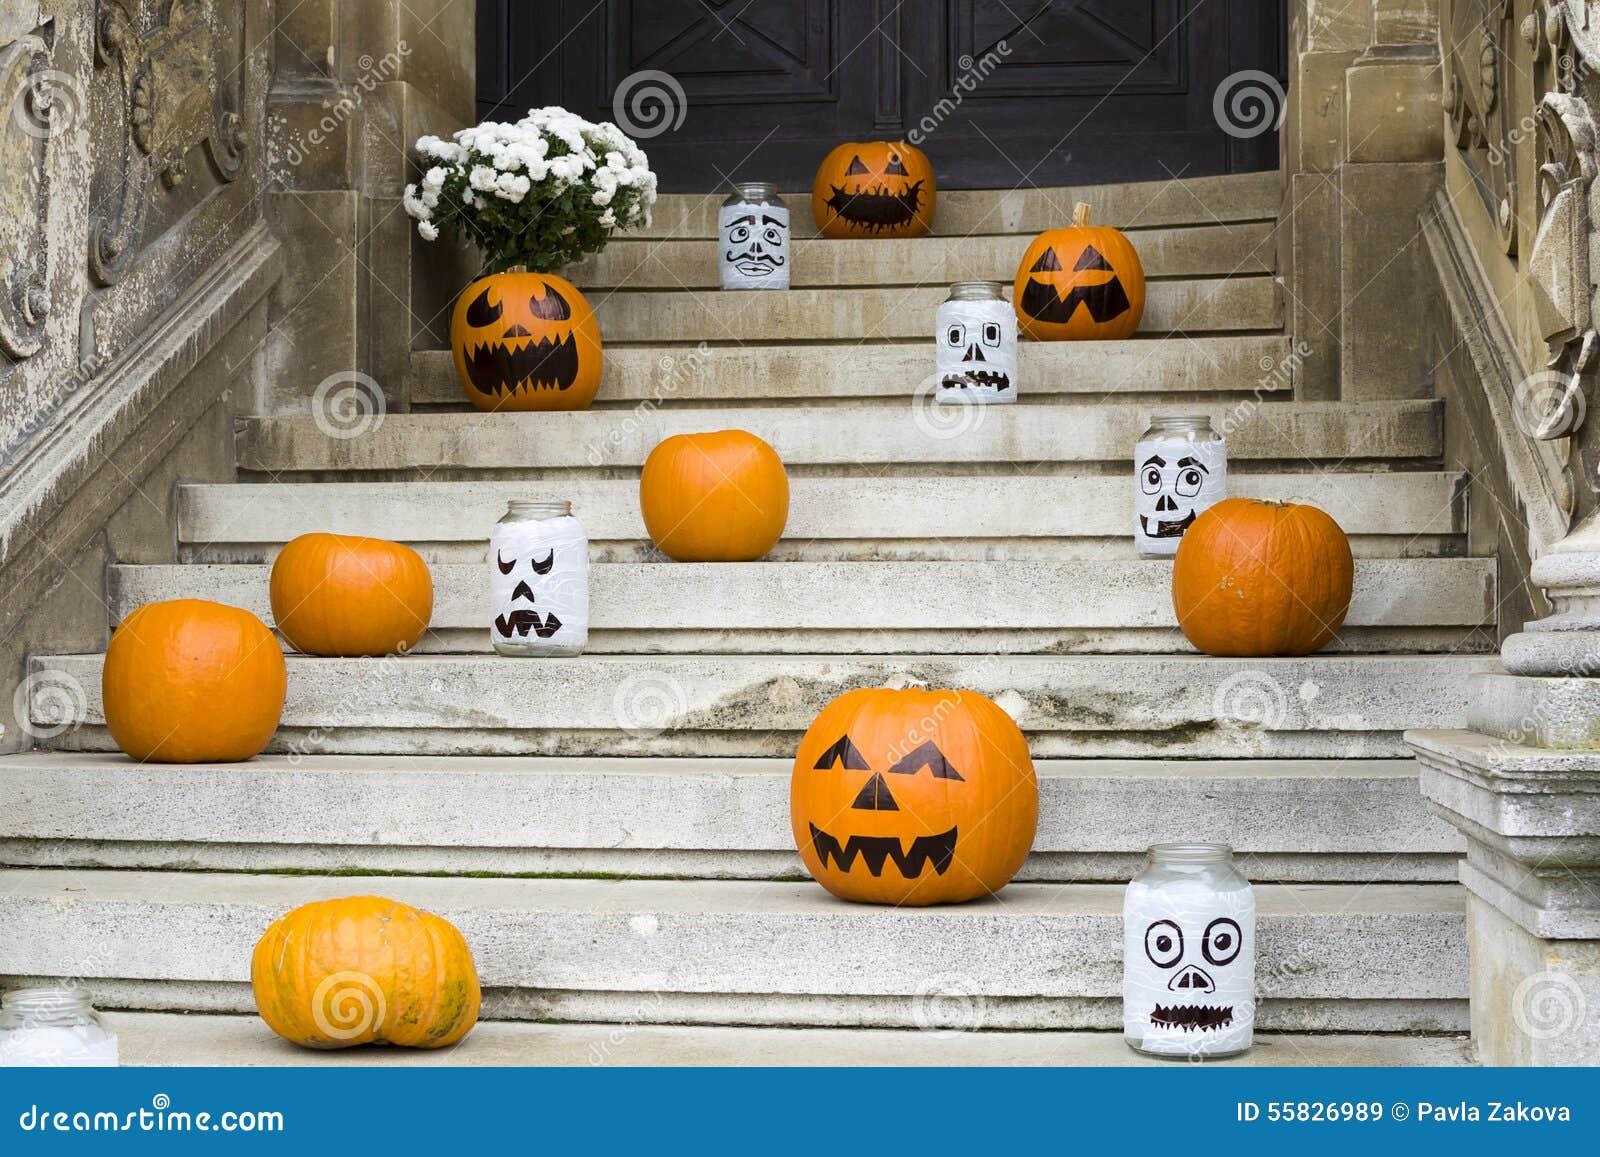 Halloween Pumpkin Decoration On Stairs Stock Photo - Image: 55826989